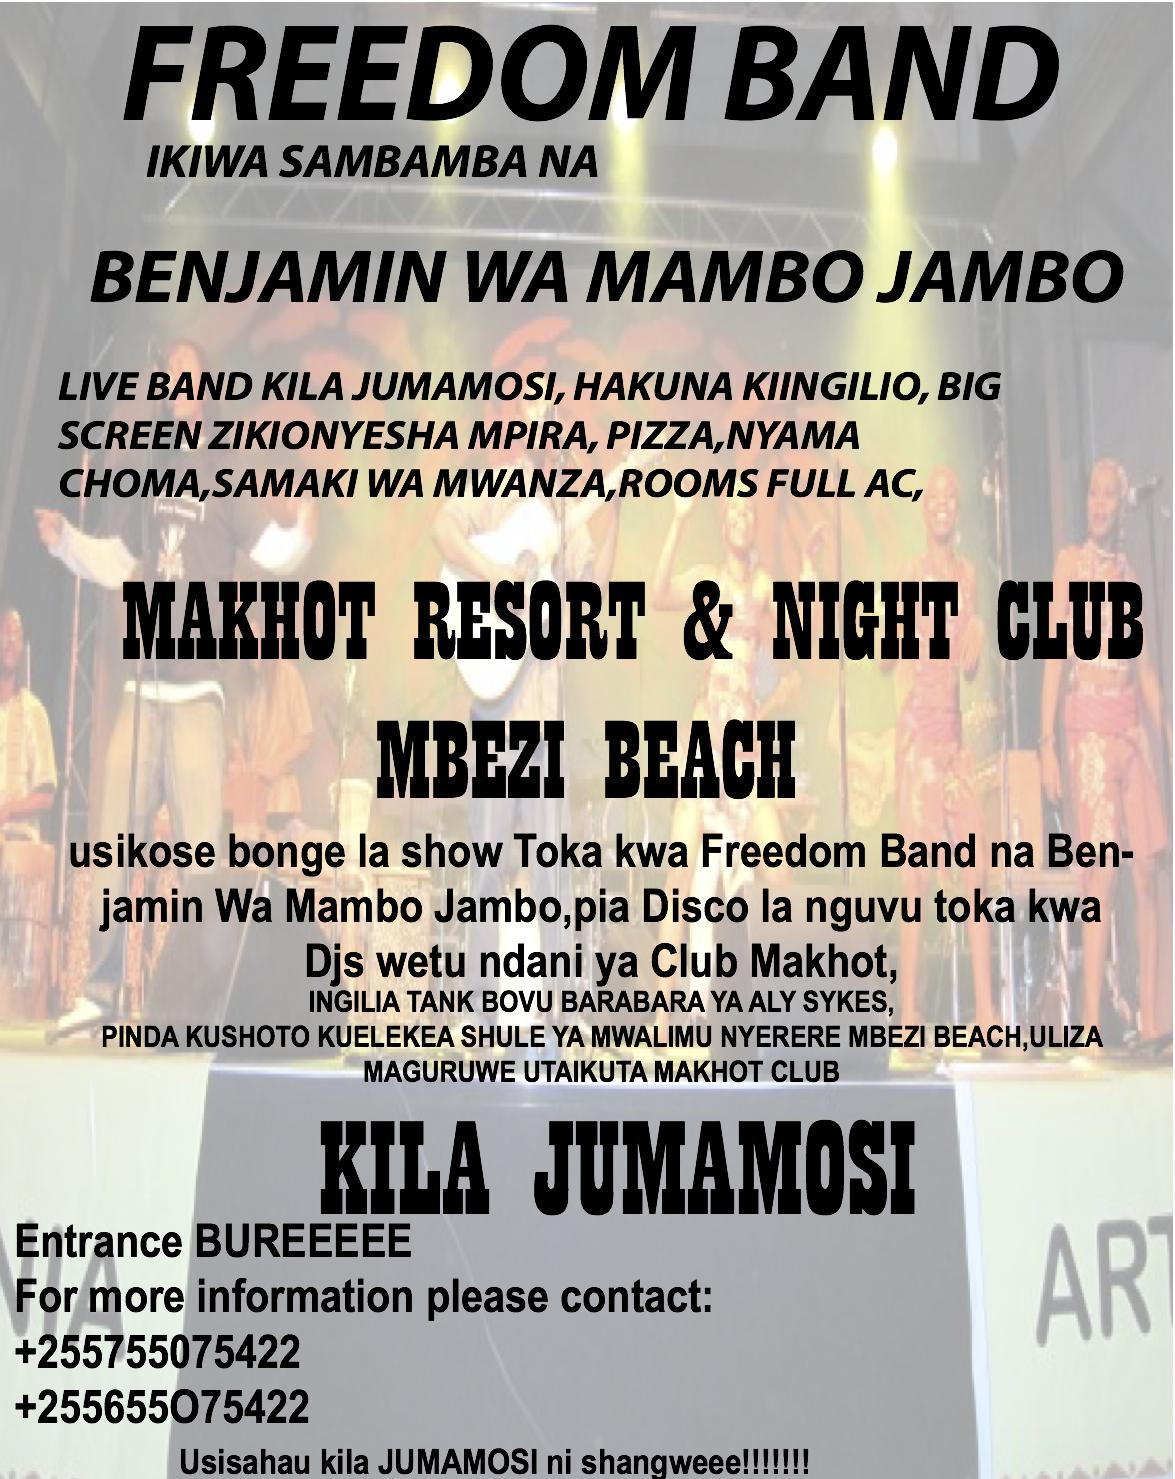 www.totolabongo.blogspot.com: show kali toka kwa freedom band